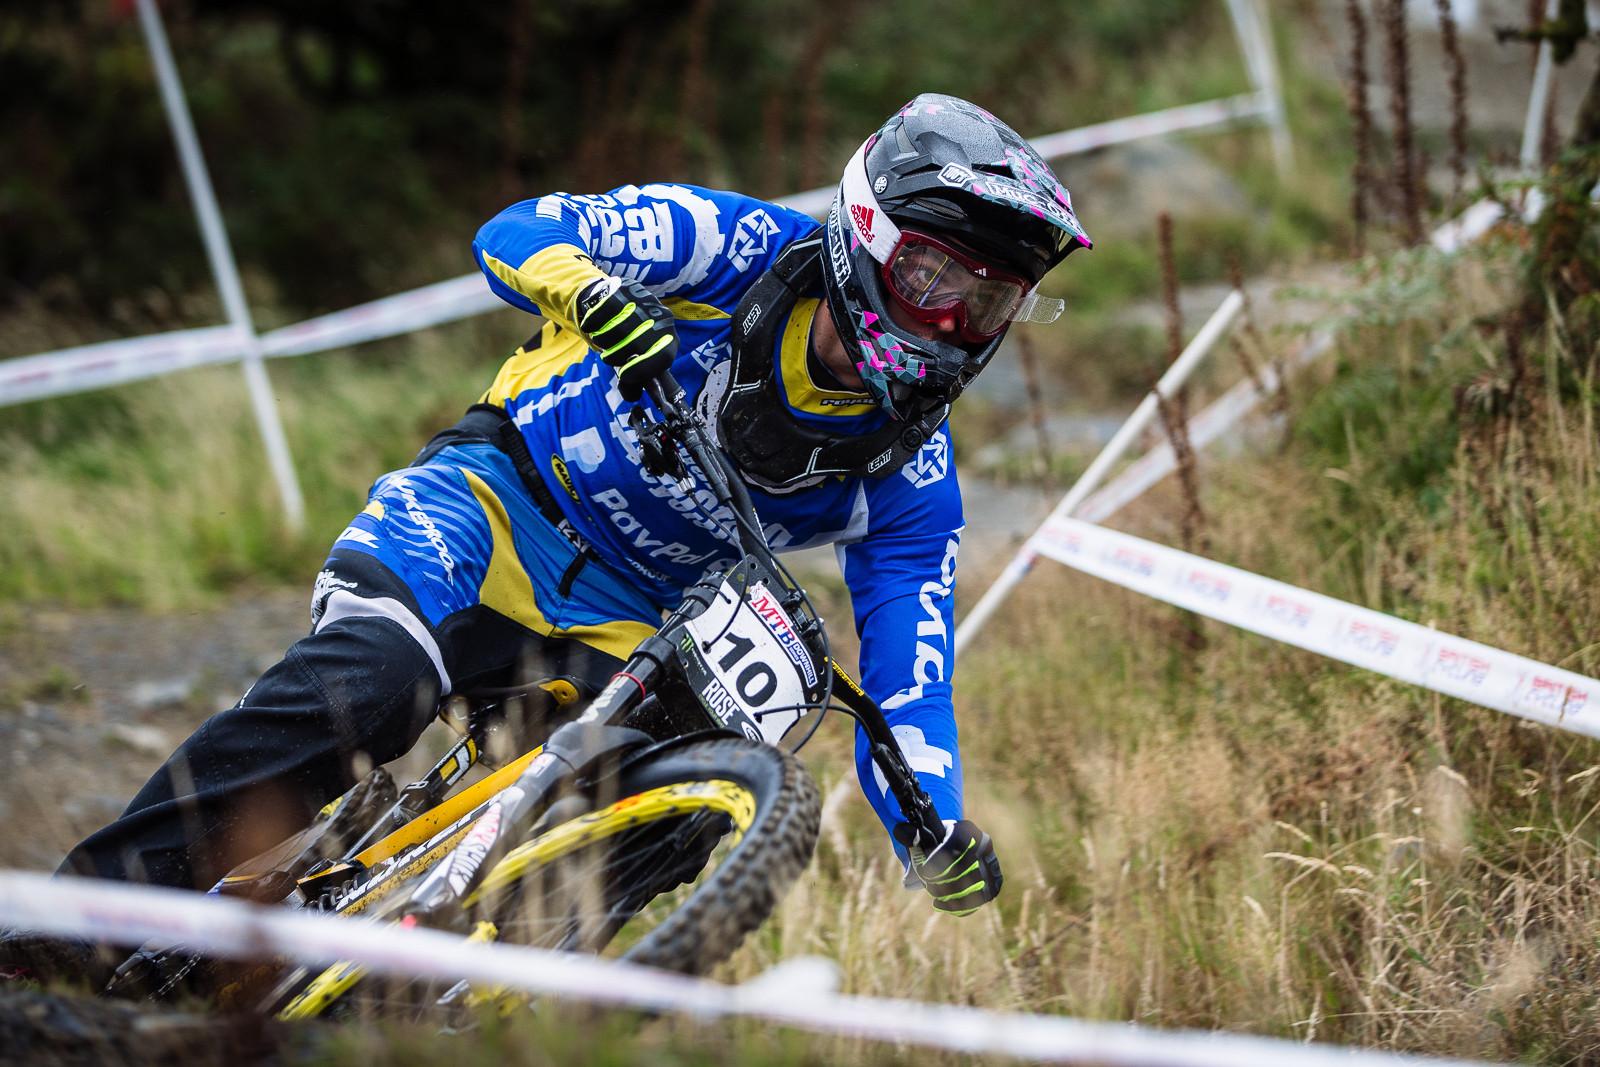 Mike Jones, 2015 British Downhill Series Finals, Antur Stiniog - 2015 British Downhill Series Finals - Mountain Biking Pictures - Vital MTB